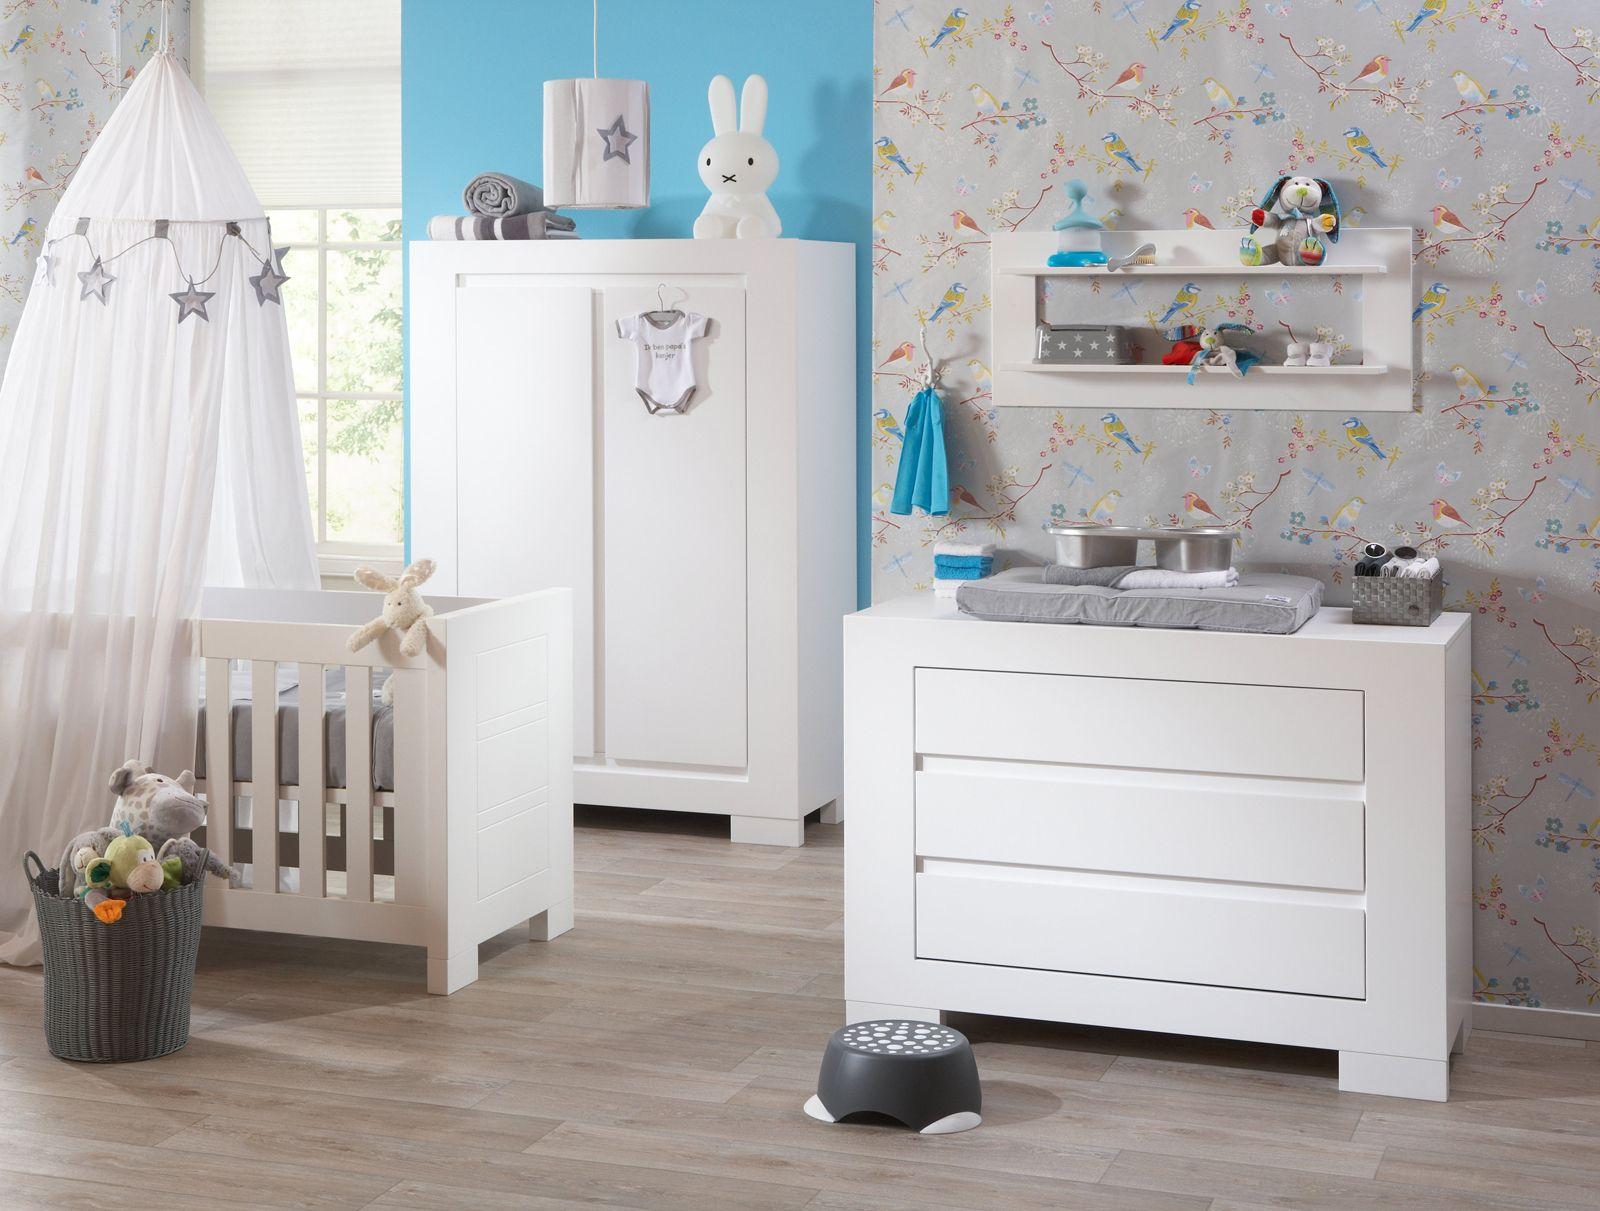 Babykamer Miami Kinderkamer : Twf europe mobiliario infantil babyroom babykamer conjunto